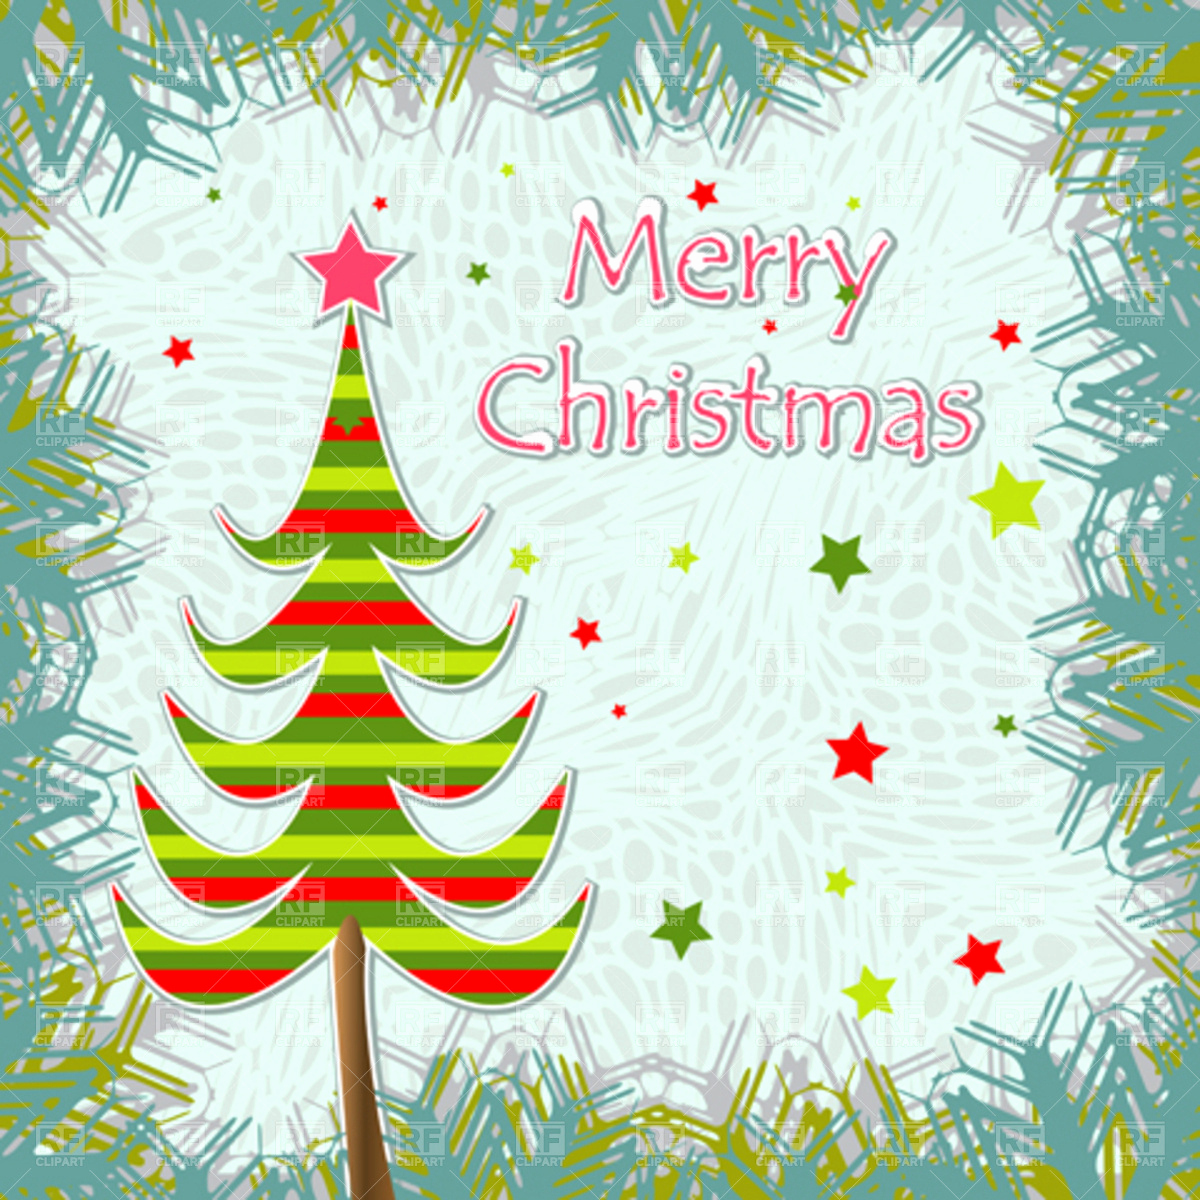 Free Greeting Card Templates Elegant Free Christmas Card Templates